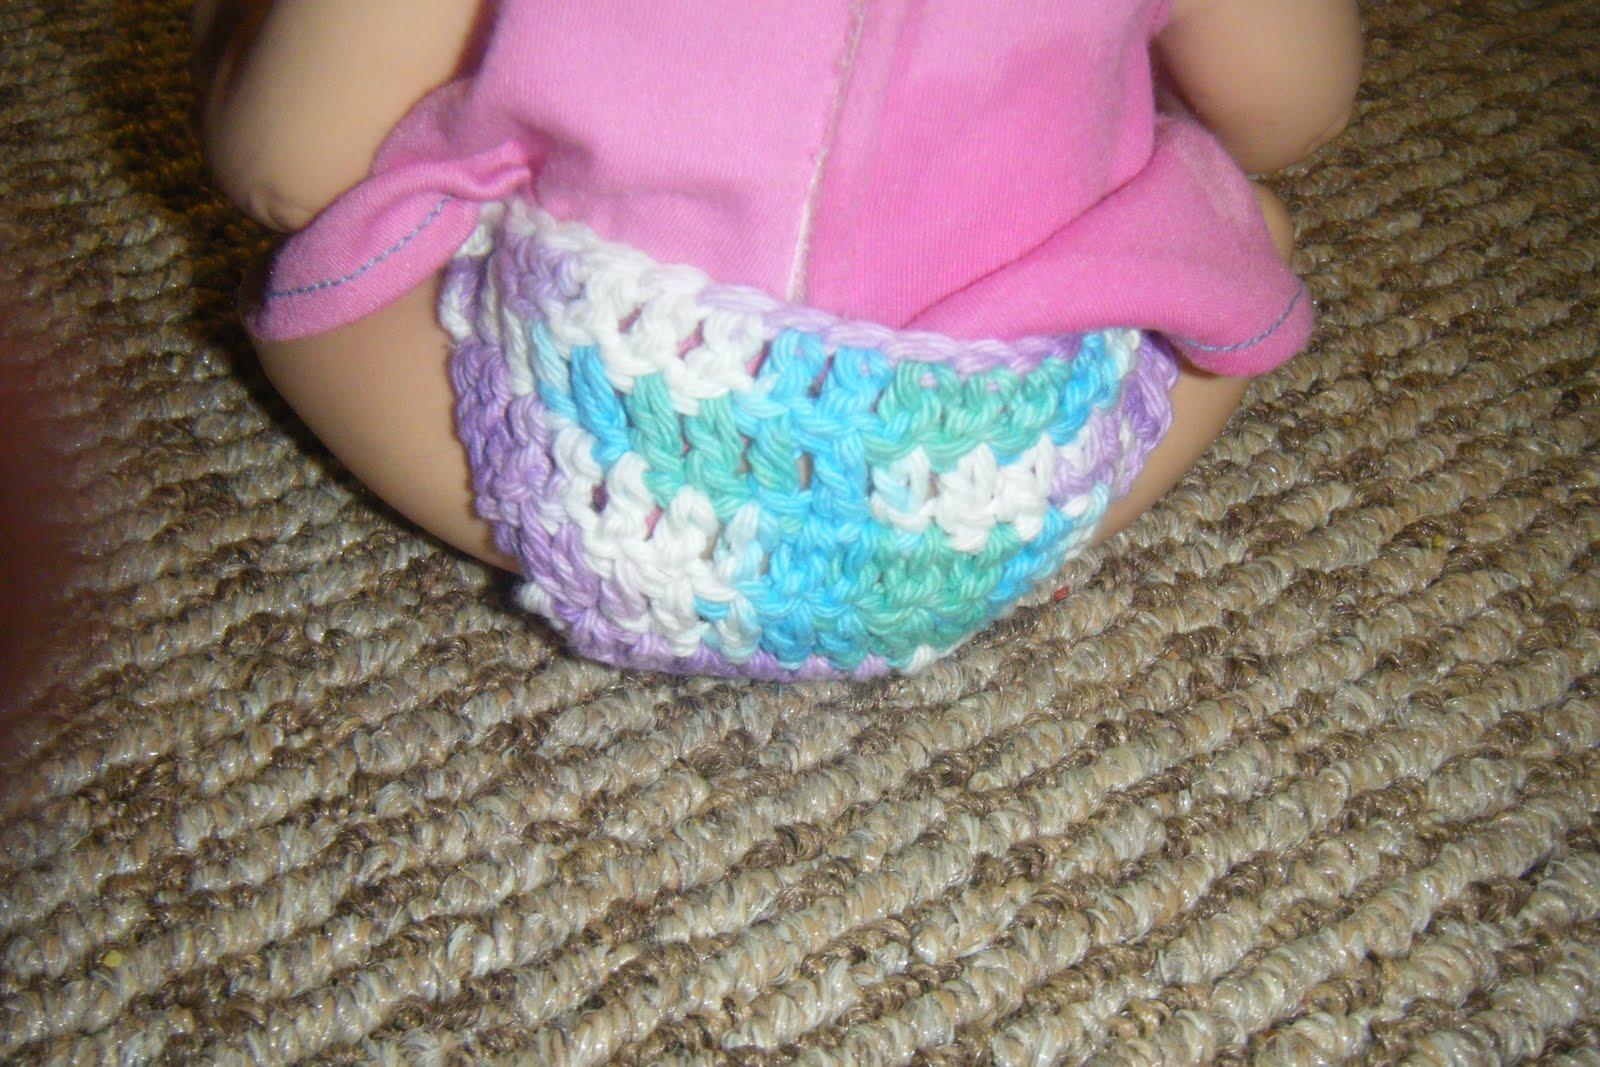 Crochet Pattern For Doll Diaper : The Craftivist: Free Crochet Pattern